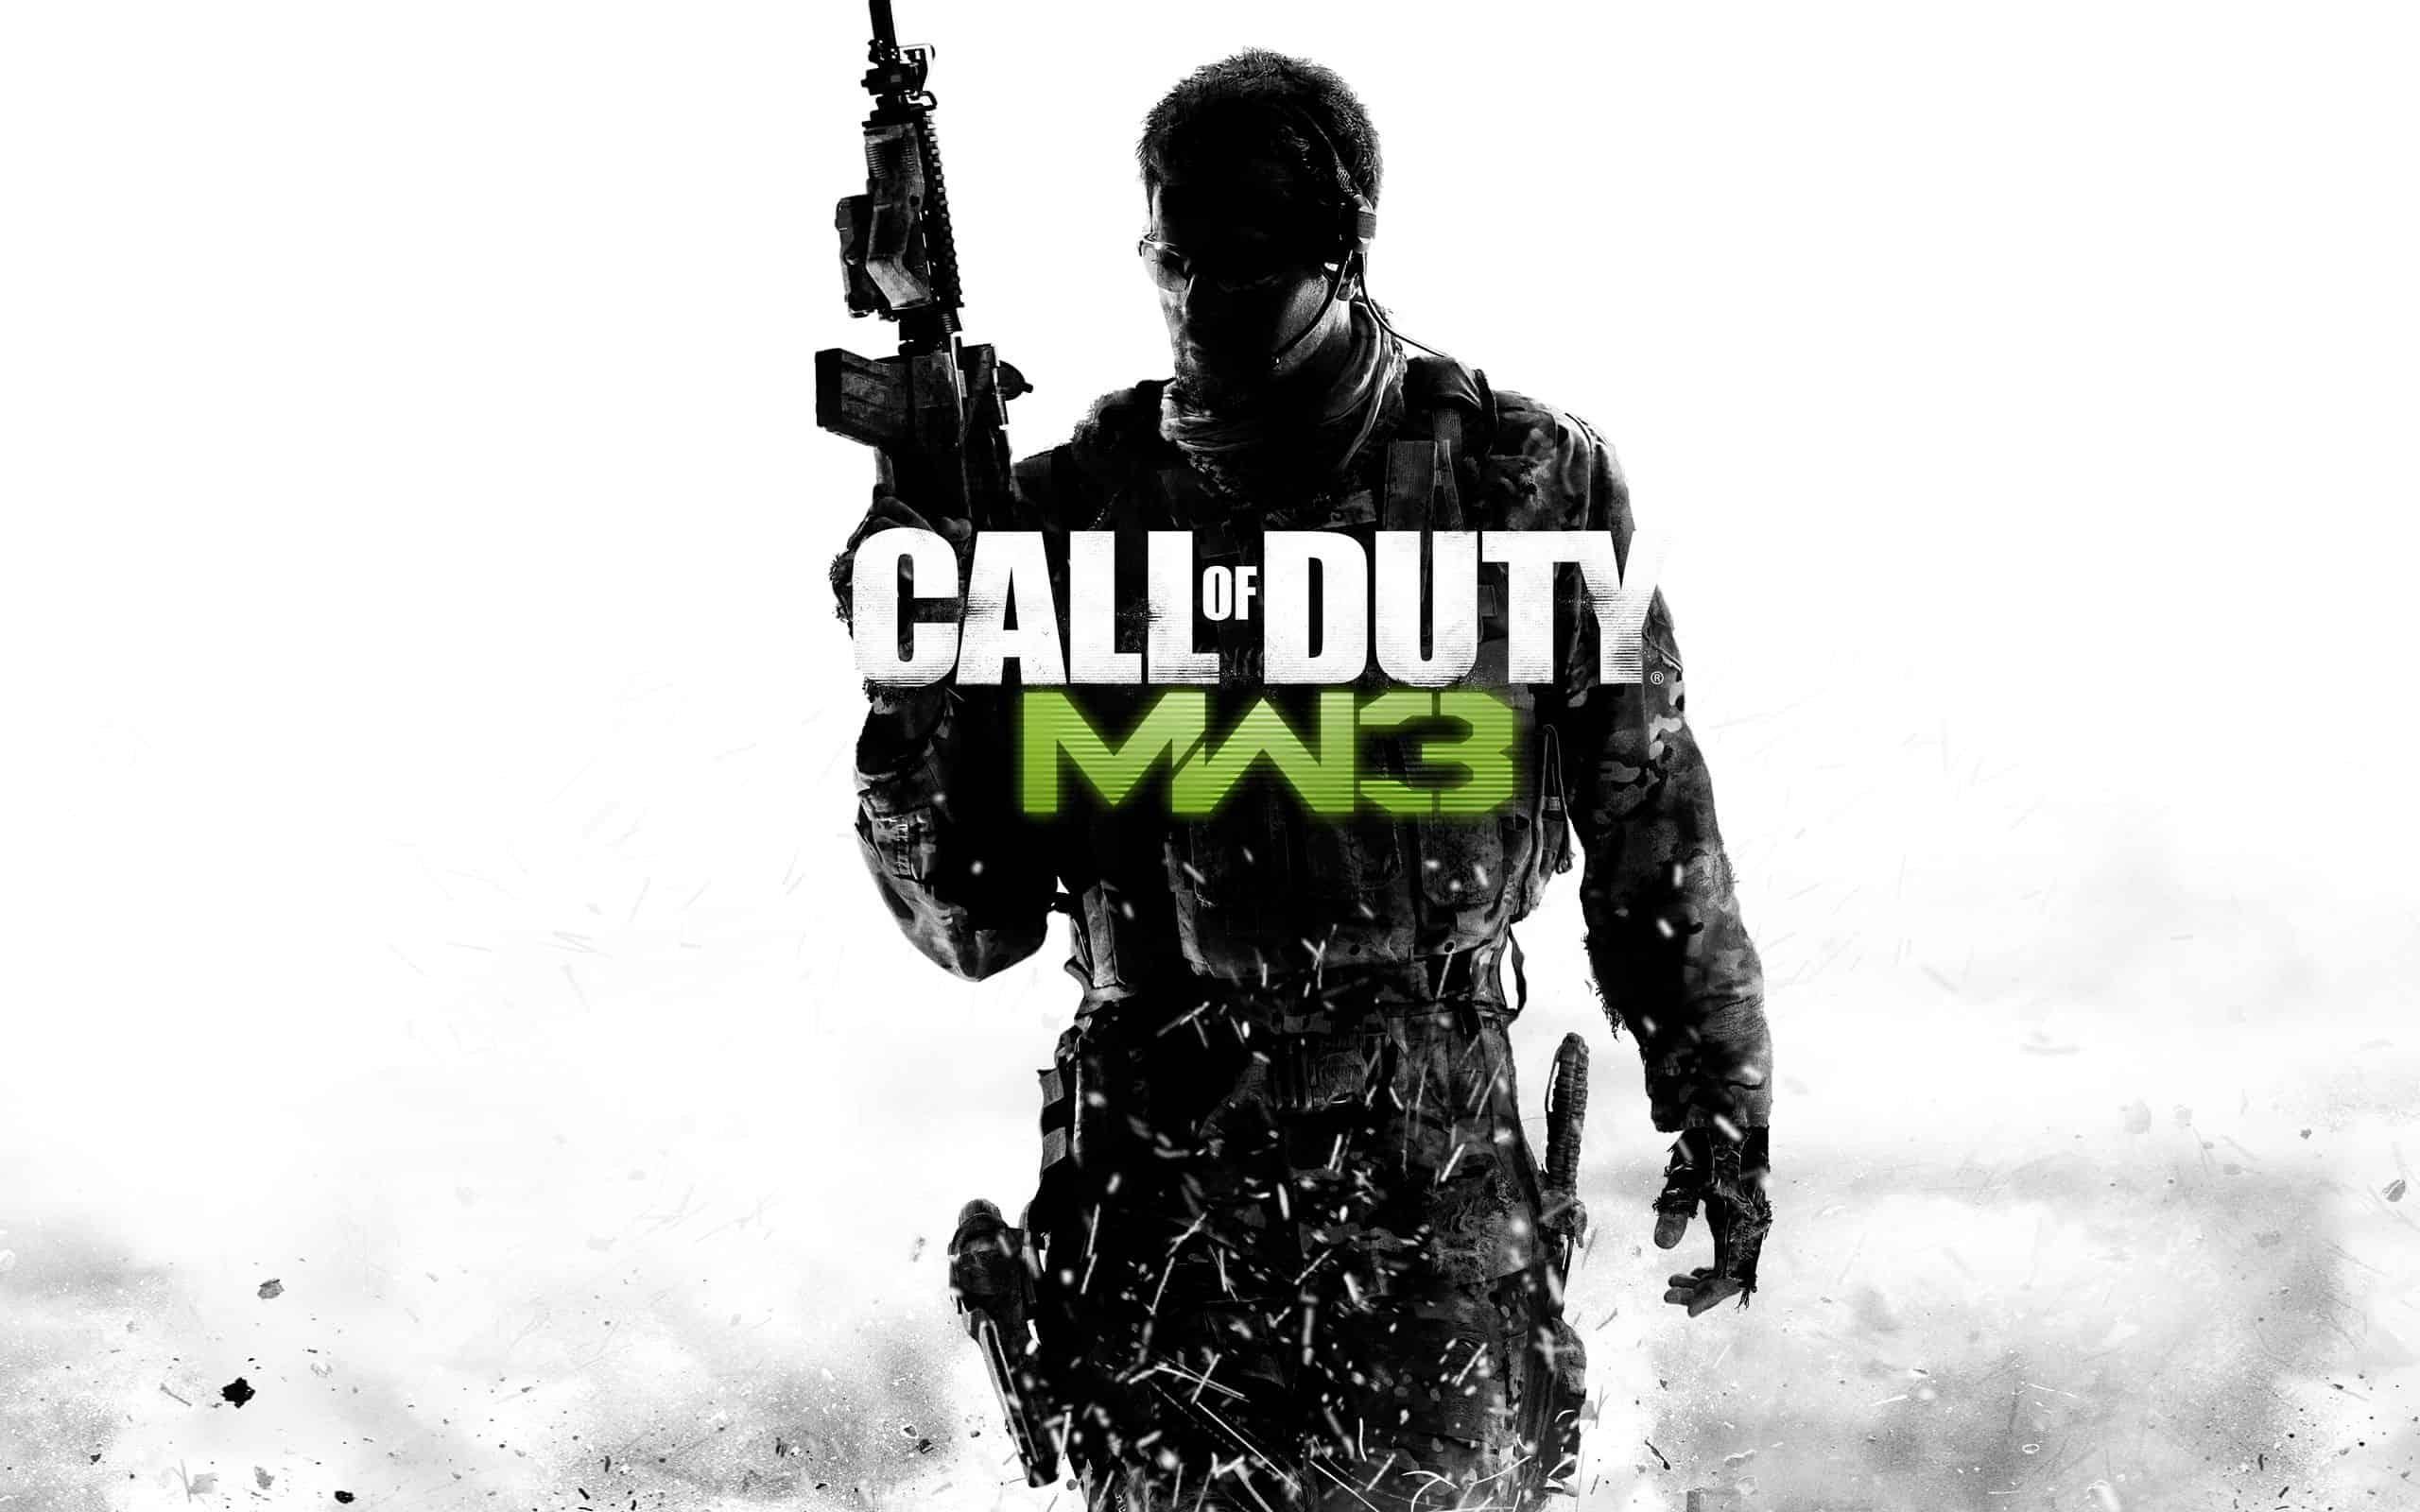 Best Call of Duty Games - Call of Duty Modern Warfare 3